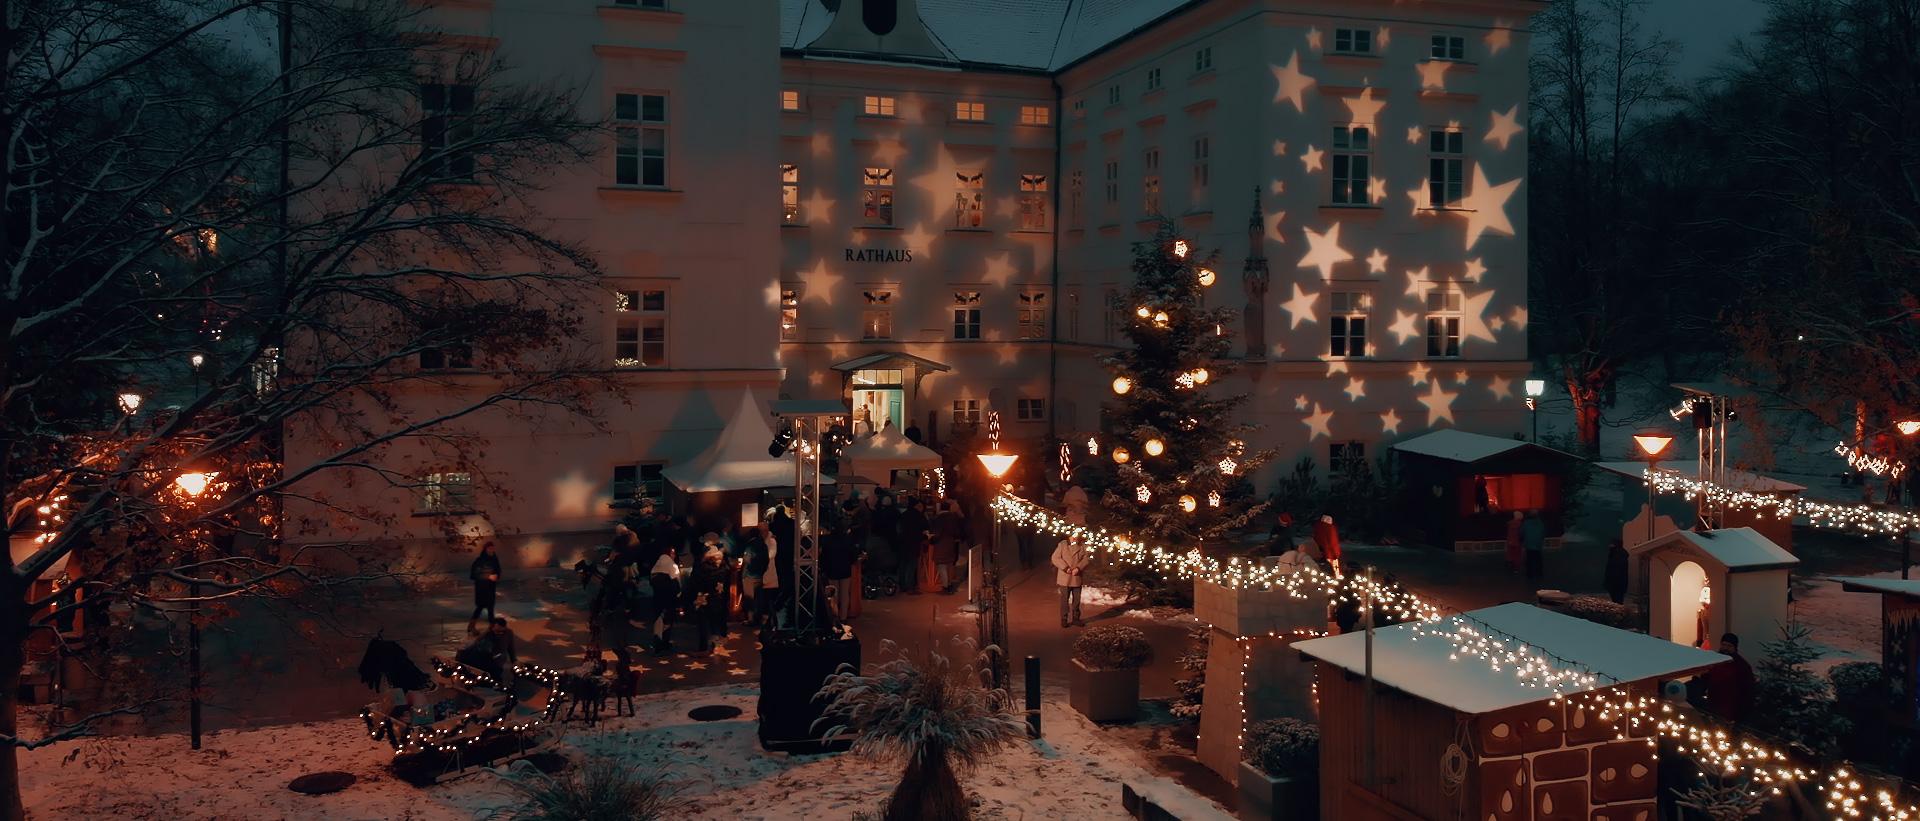 Maerchenhafer_Advent_02.jpg